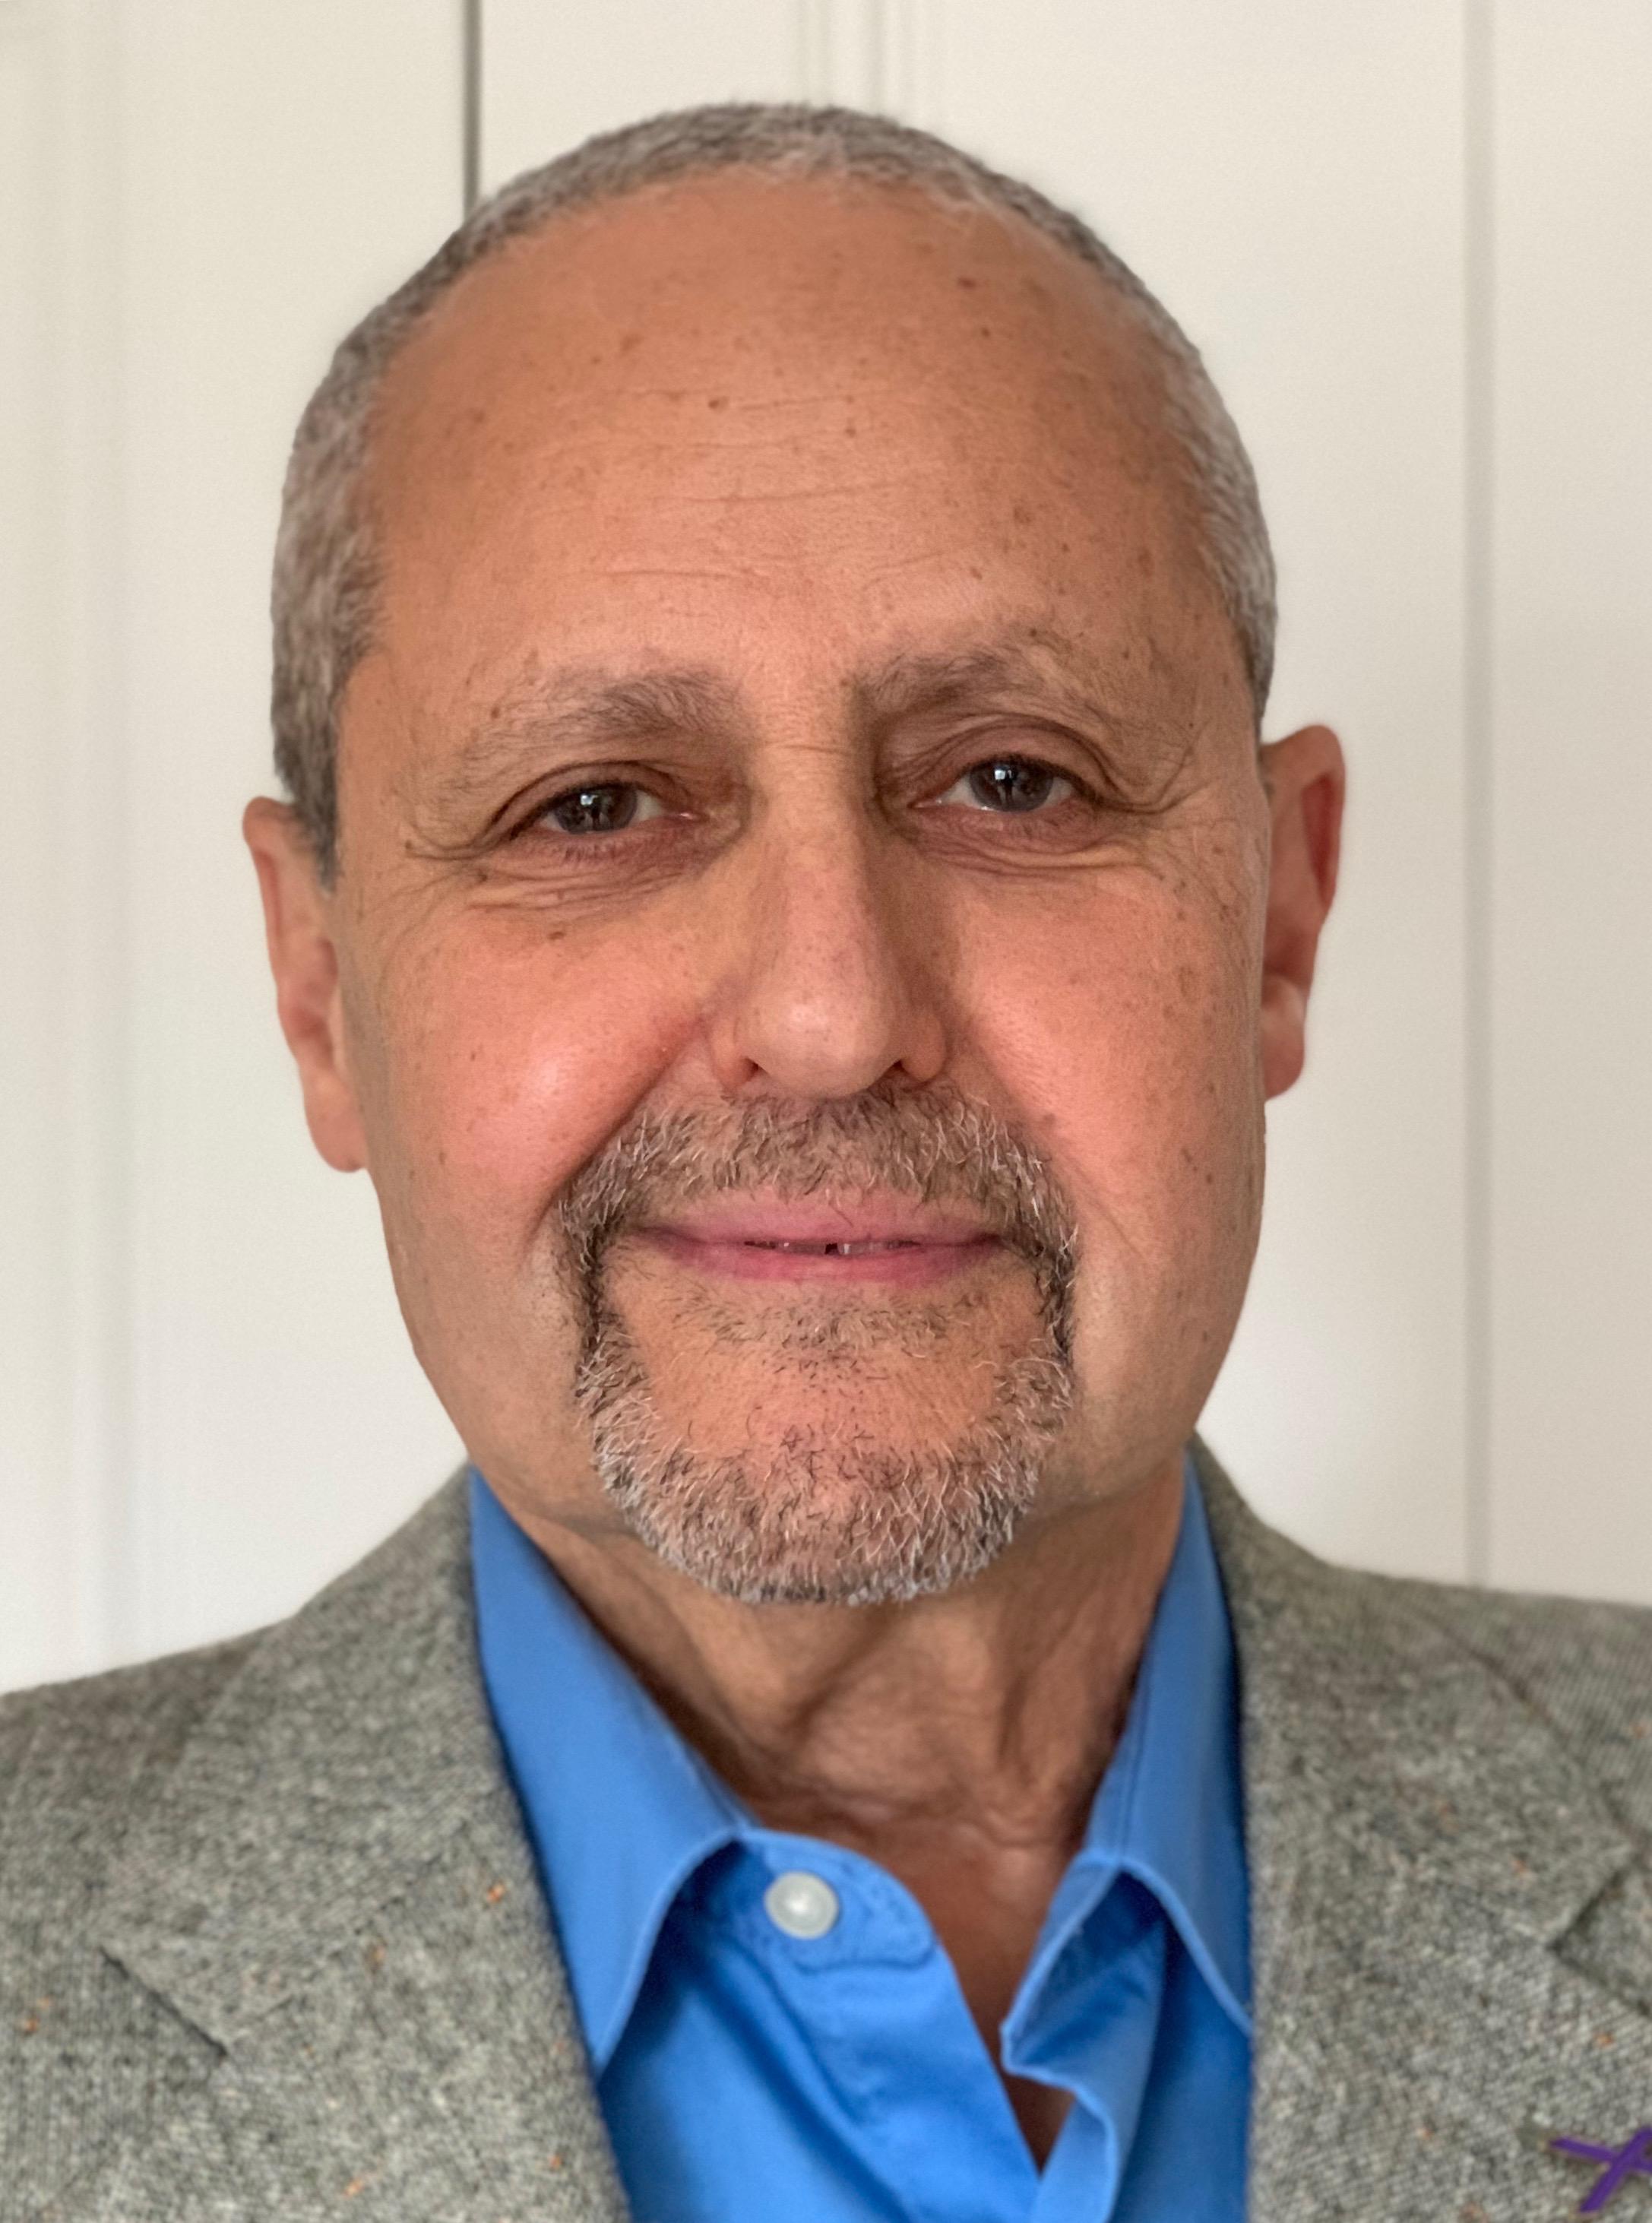 Dr. John Zeisel  Board of directors